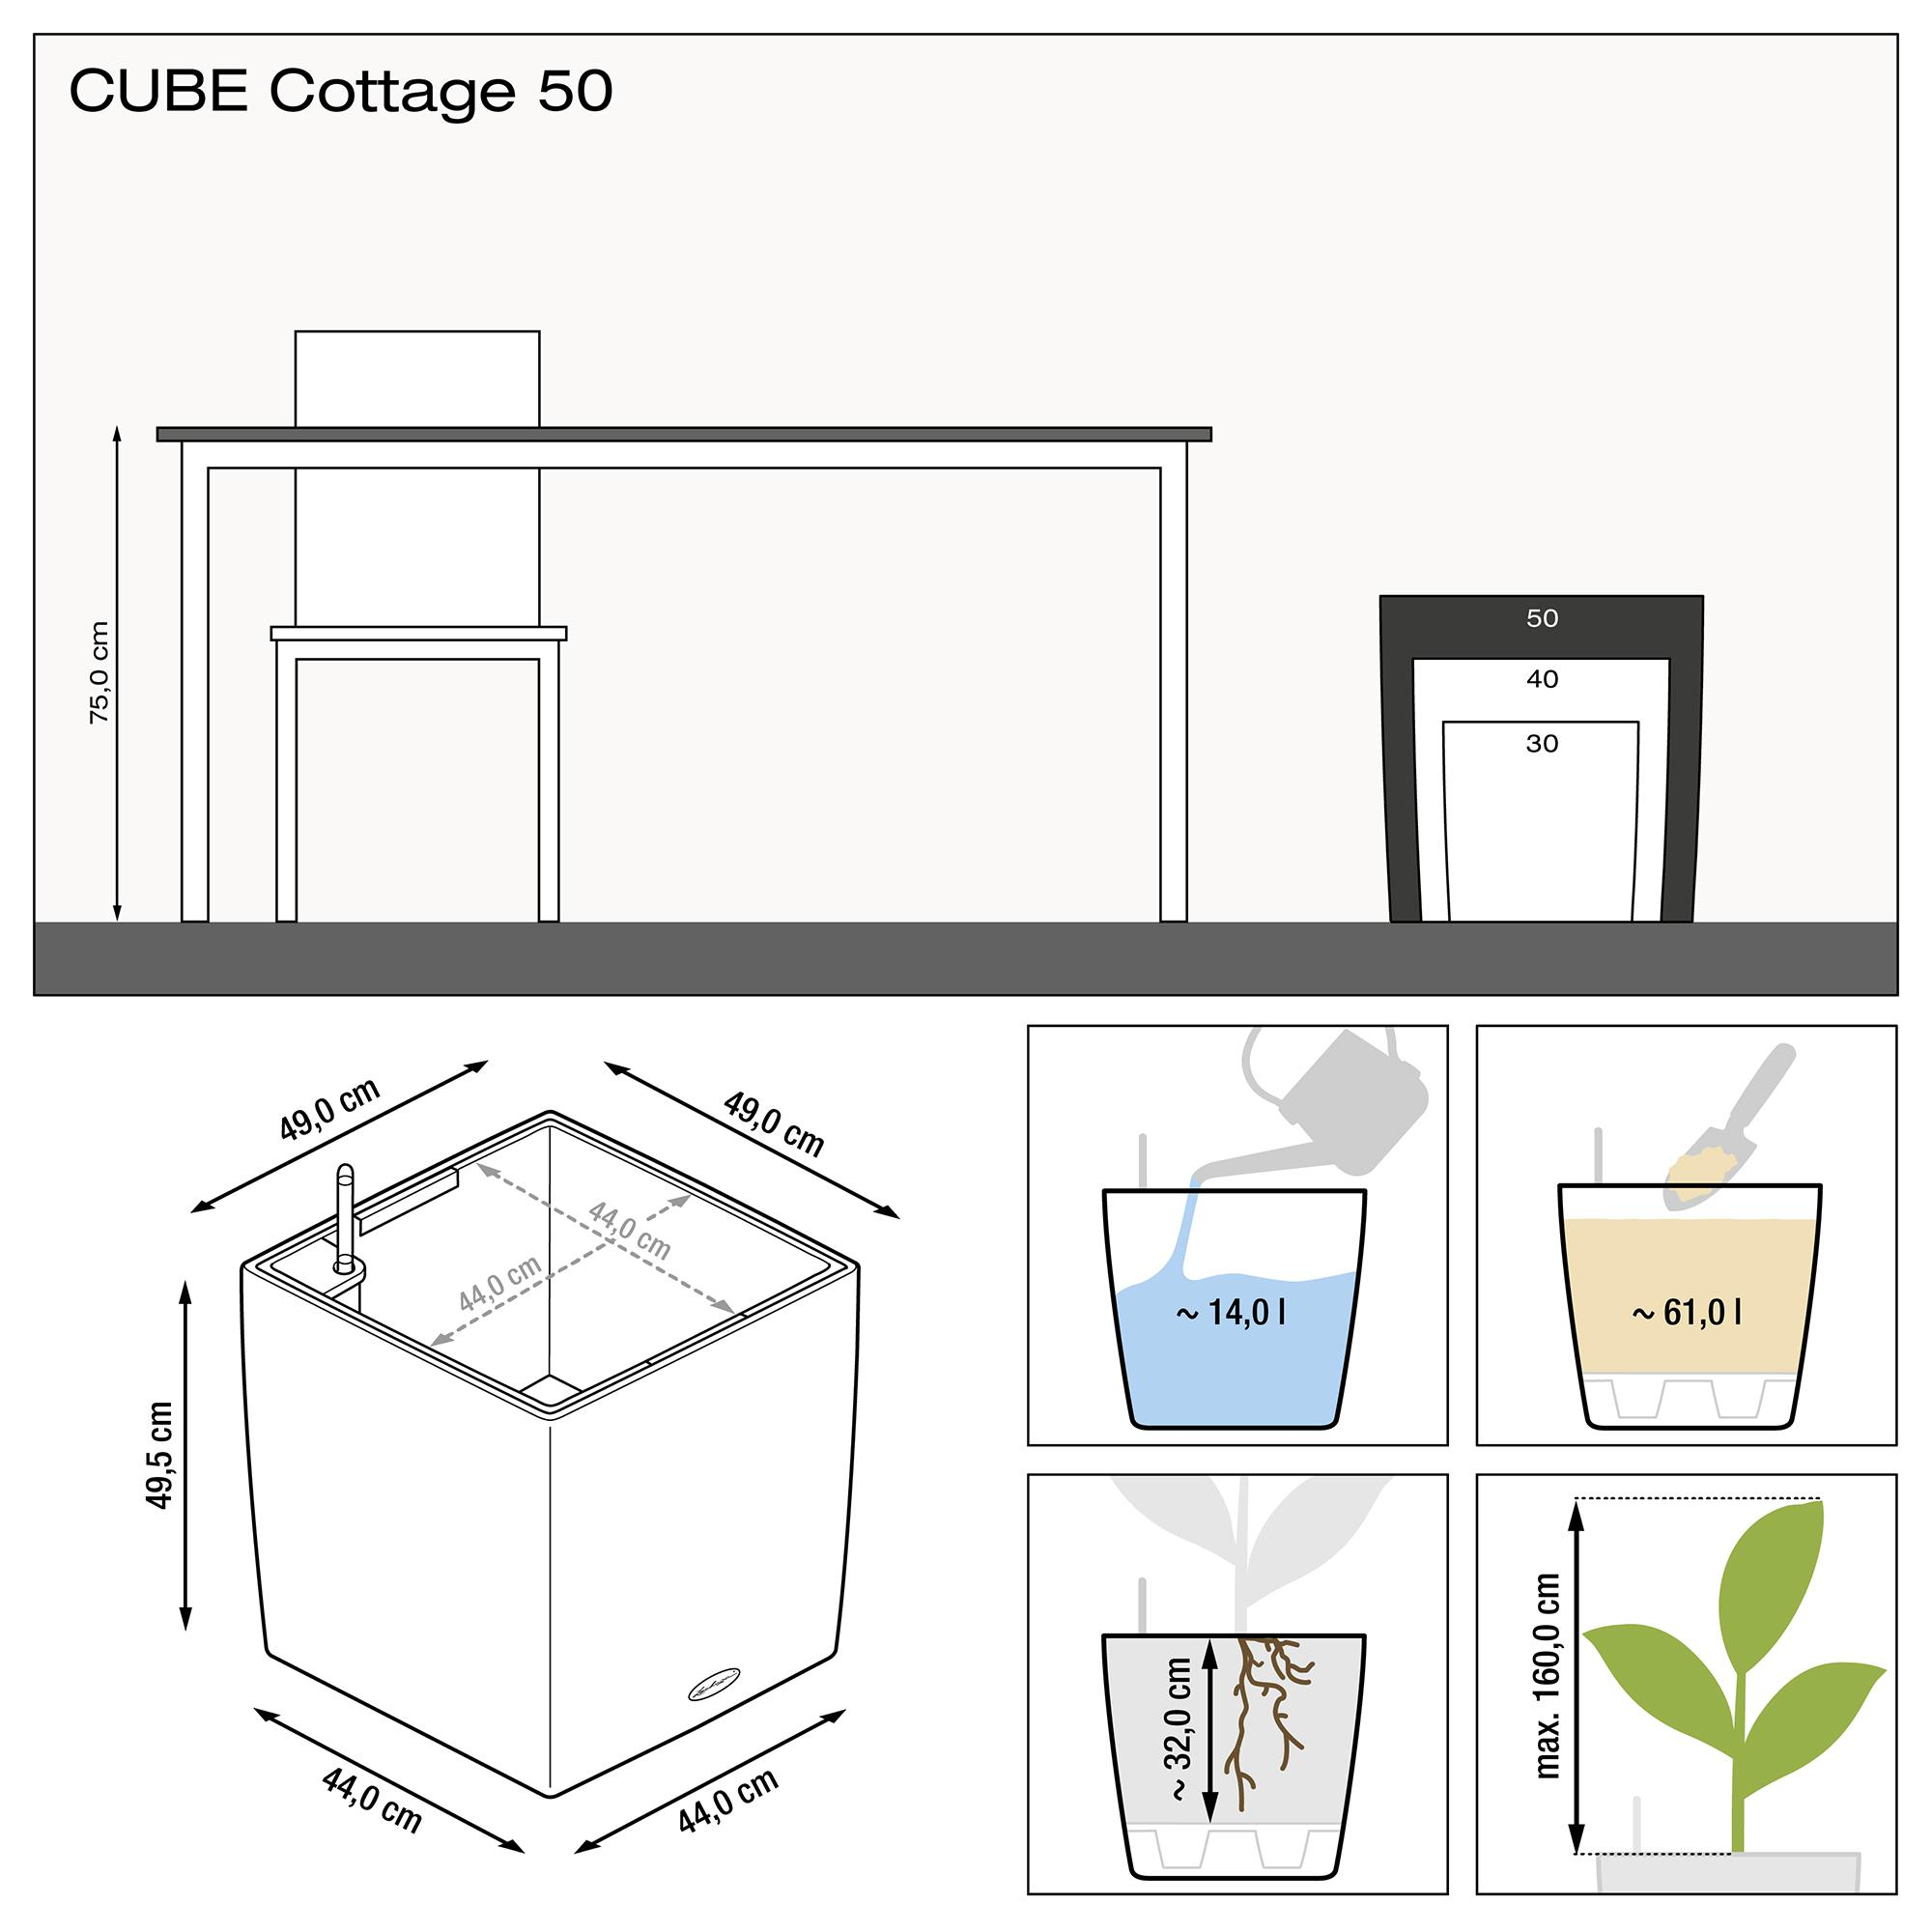 CUBE Cottage 50 blanco - Imagen 3